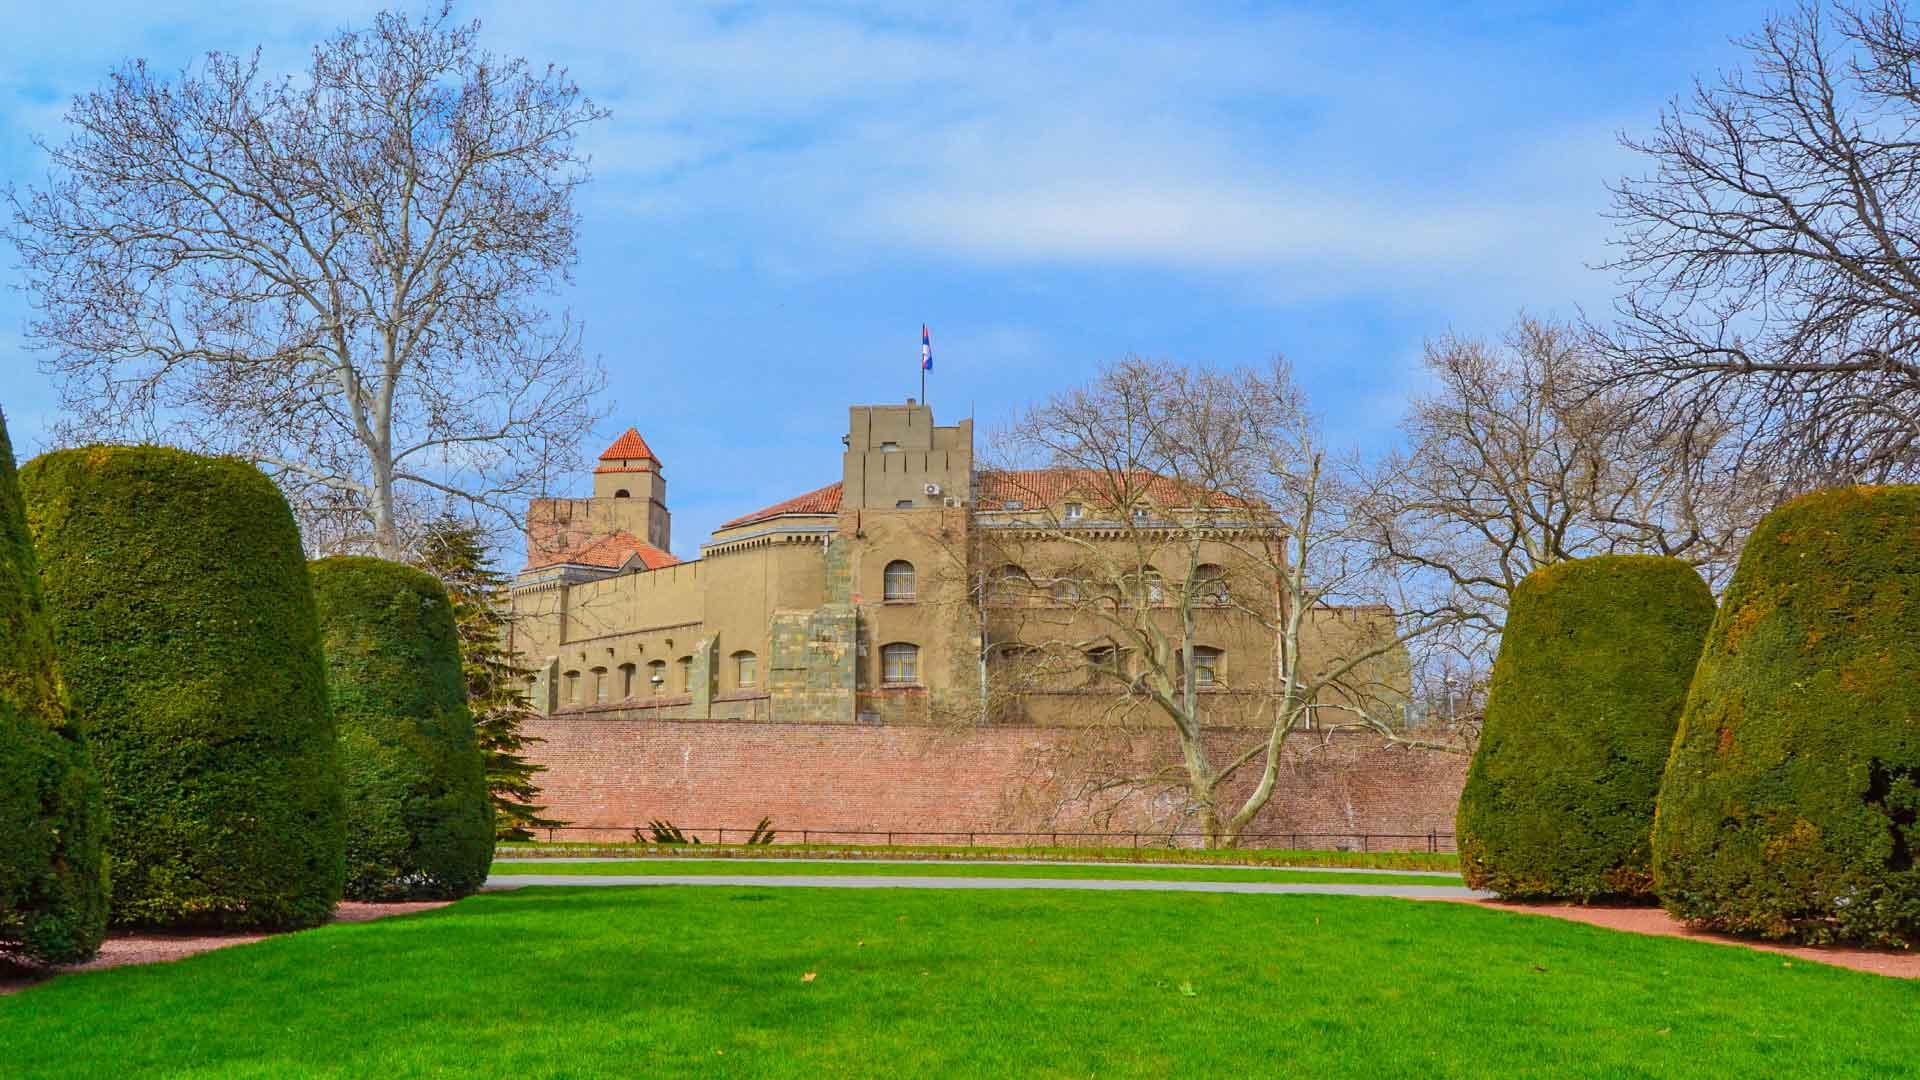 beograd castle